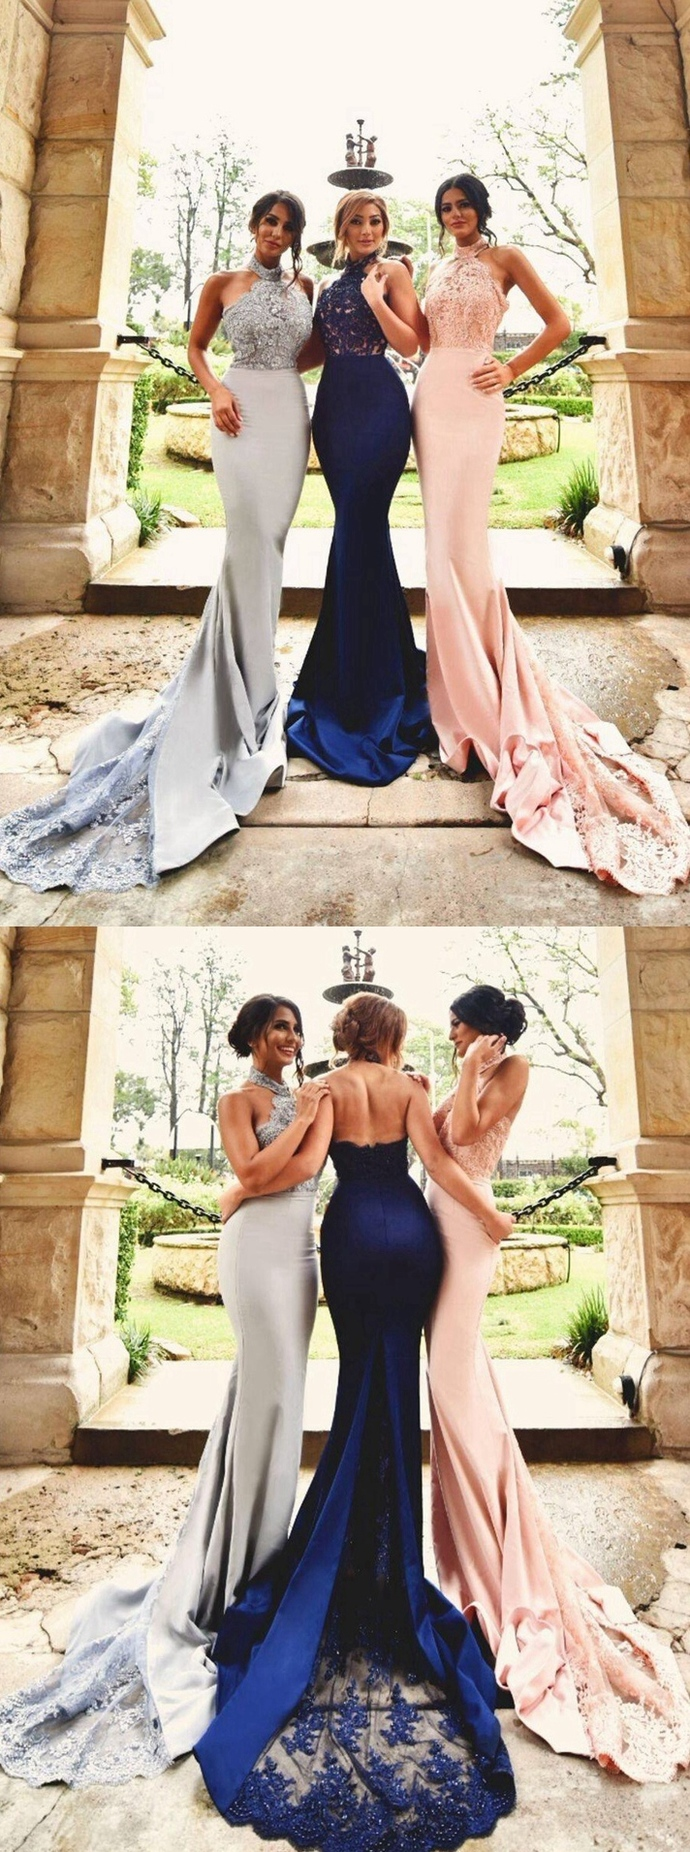 Mermaid Prom Dress High Halter Neckline, Bridesmaid Dresses,Homecoming Dress